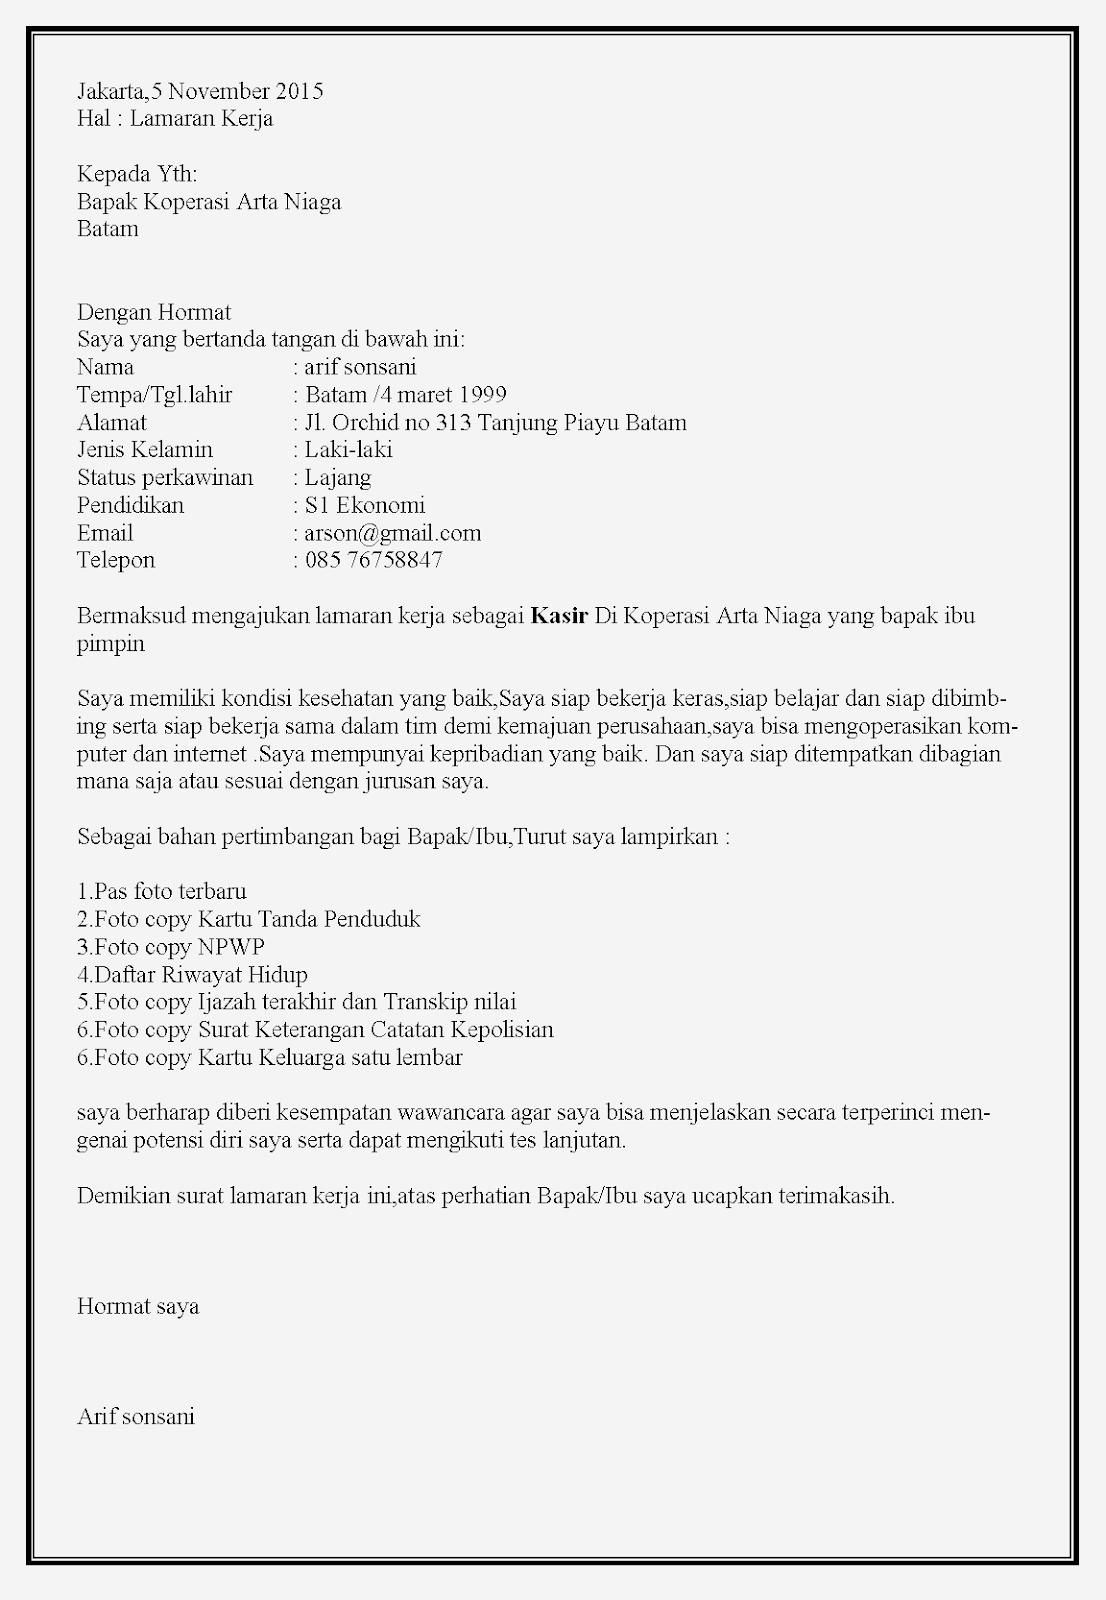 Contoh surat lamaran kerja koperasi sebagai kasir